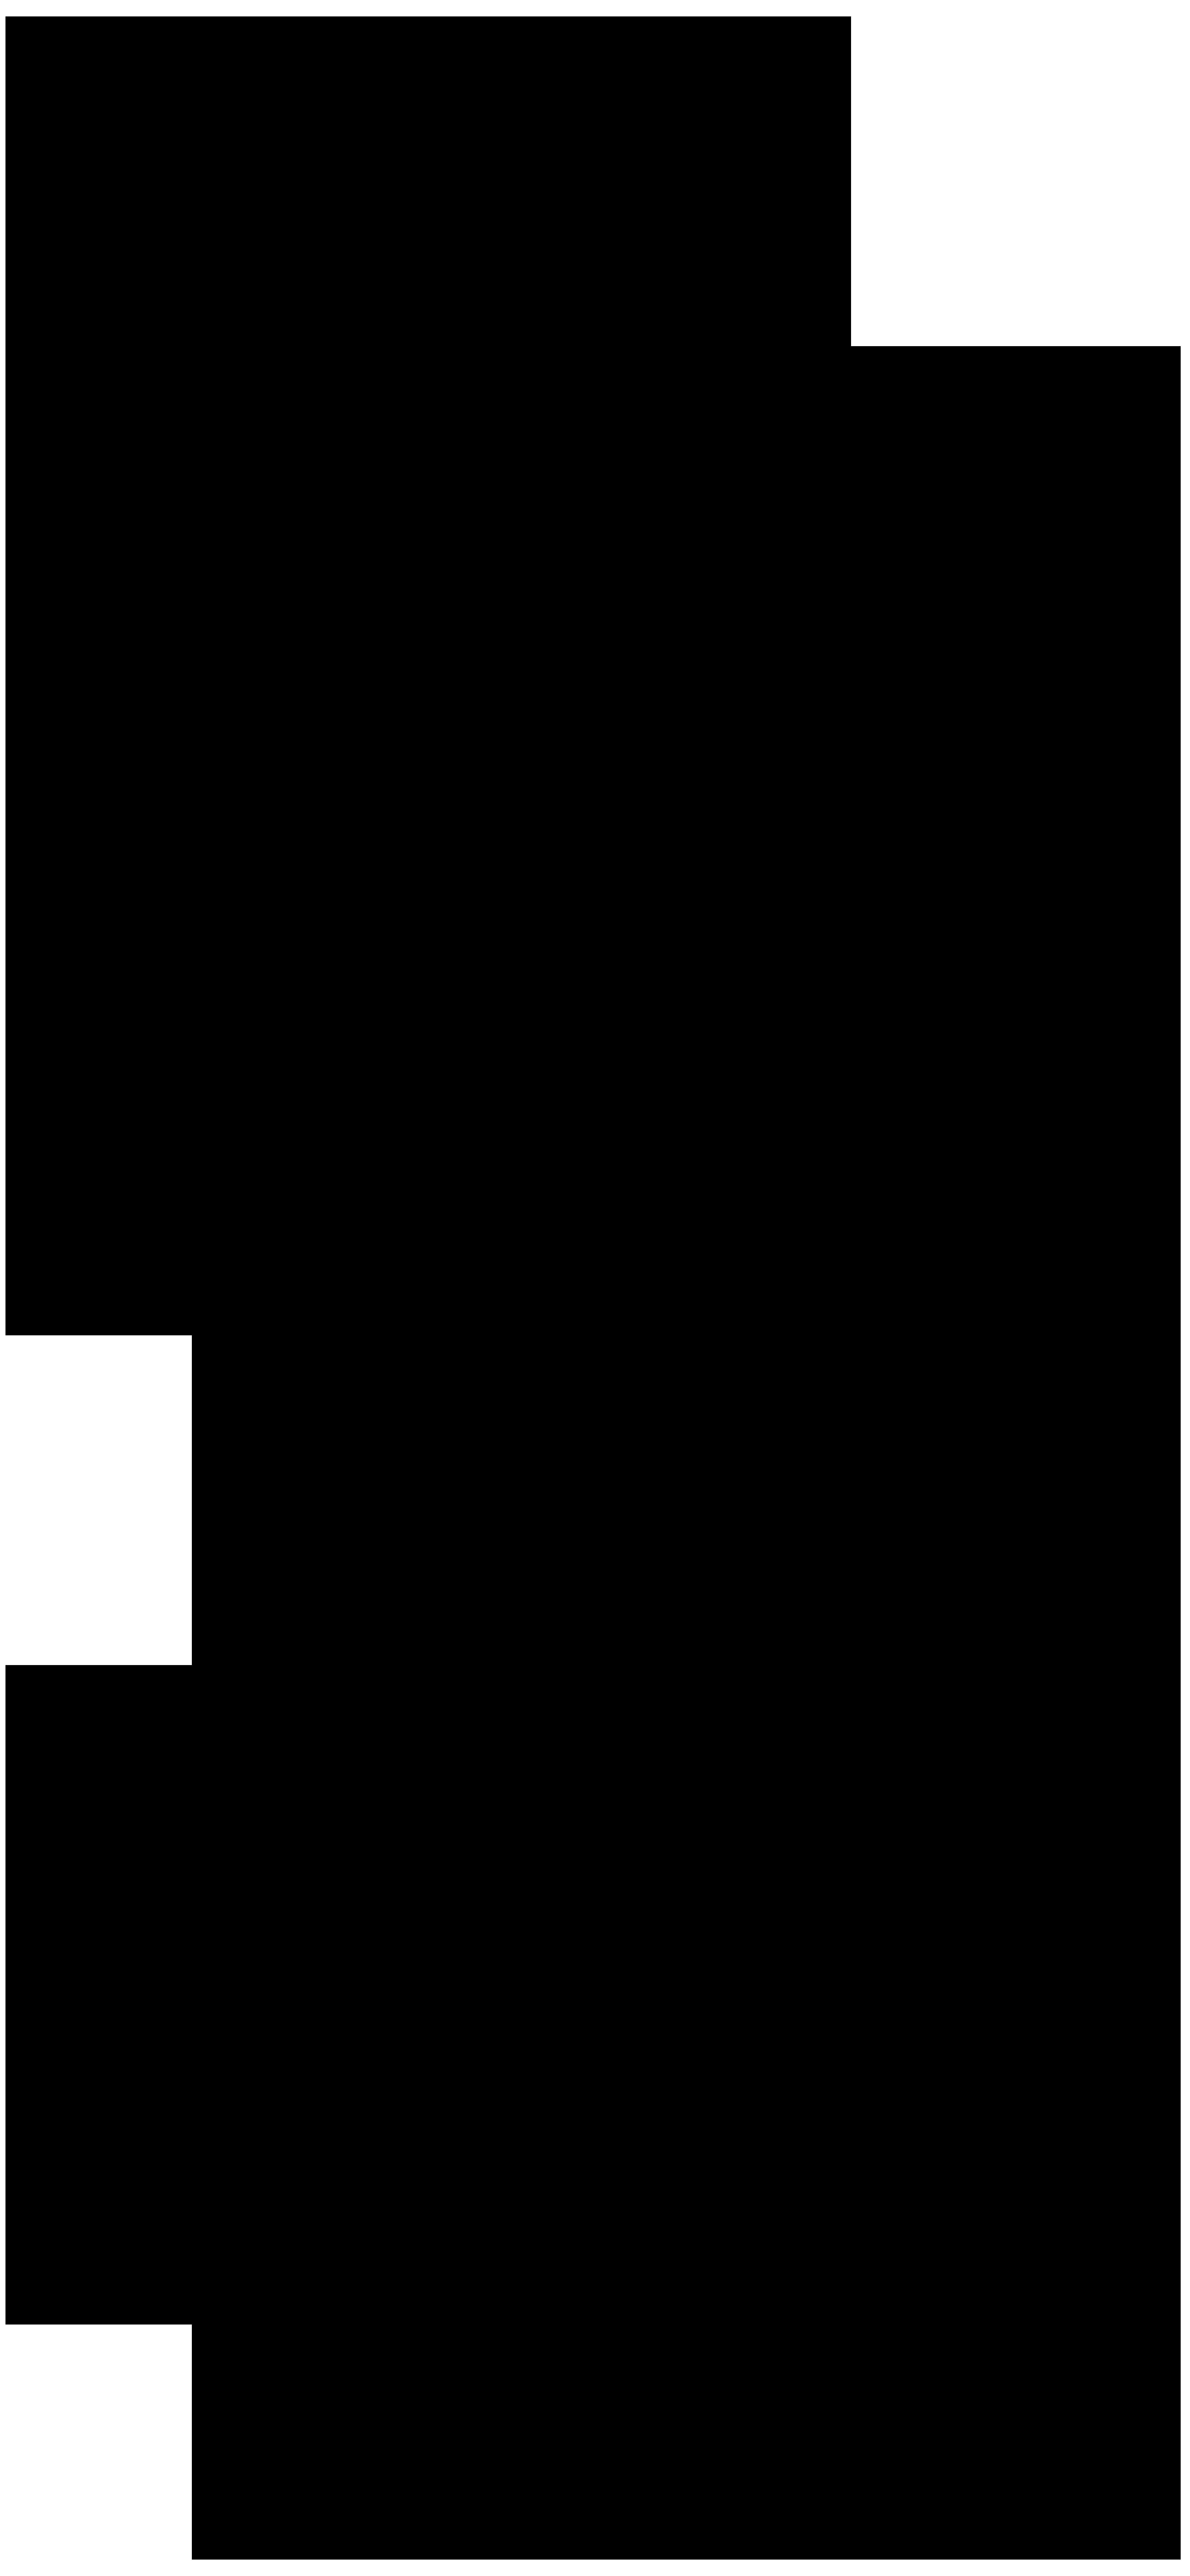 3697x8000 Bear Silhouette Png Clip Art Imageu200b Gallery Yopriceville